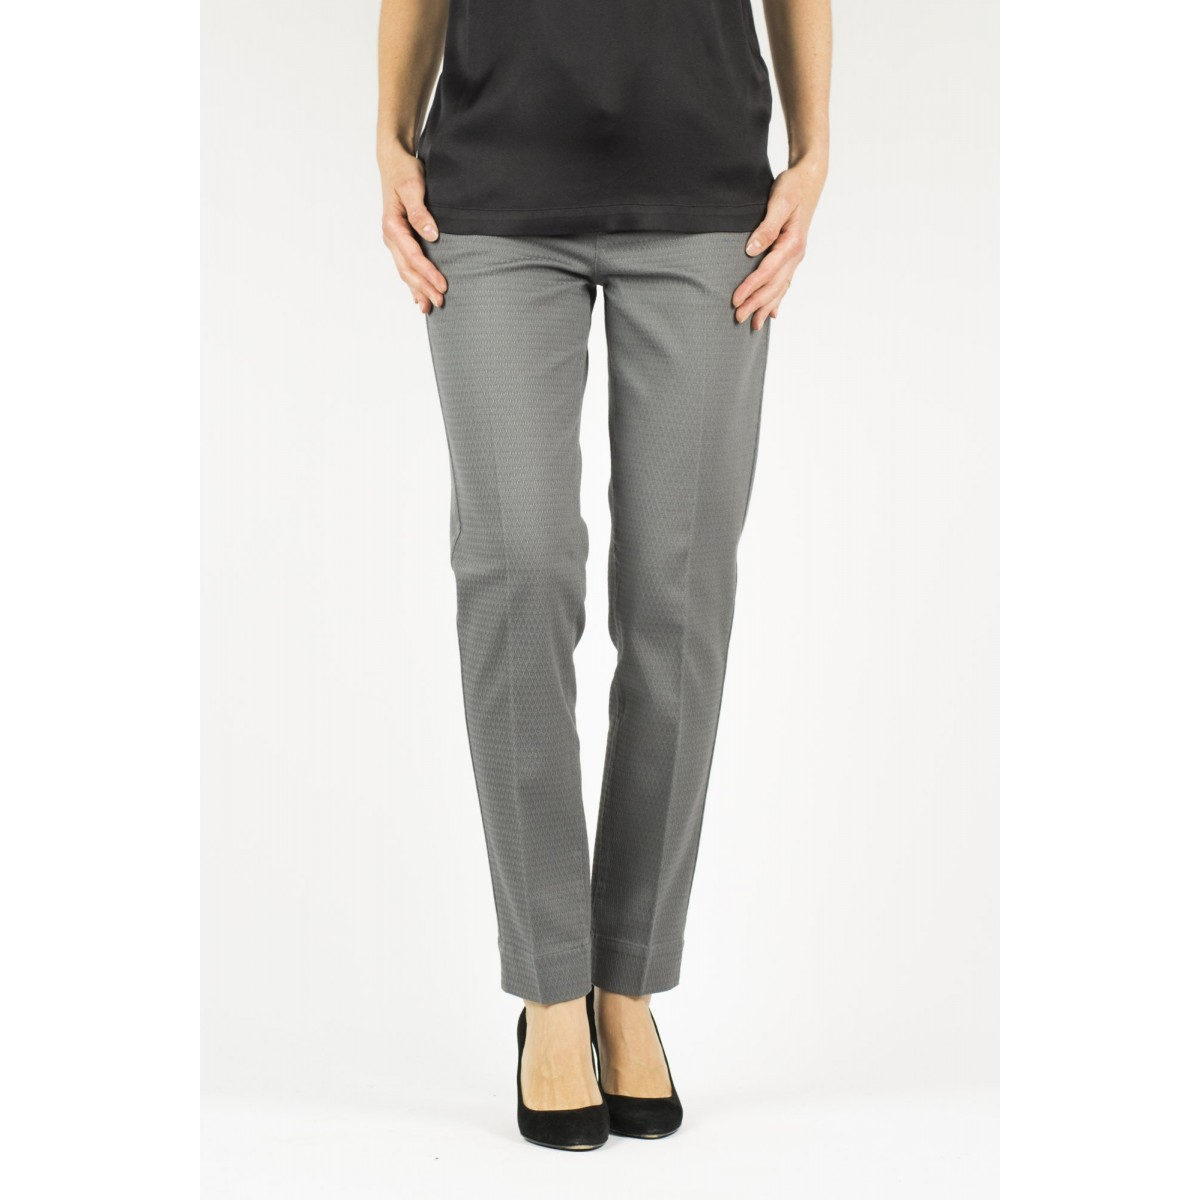 Pantalone Donna Pt0W - Tny Ts55